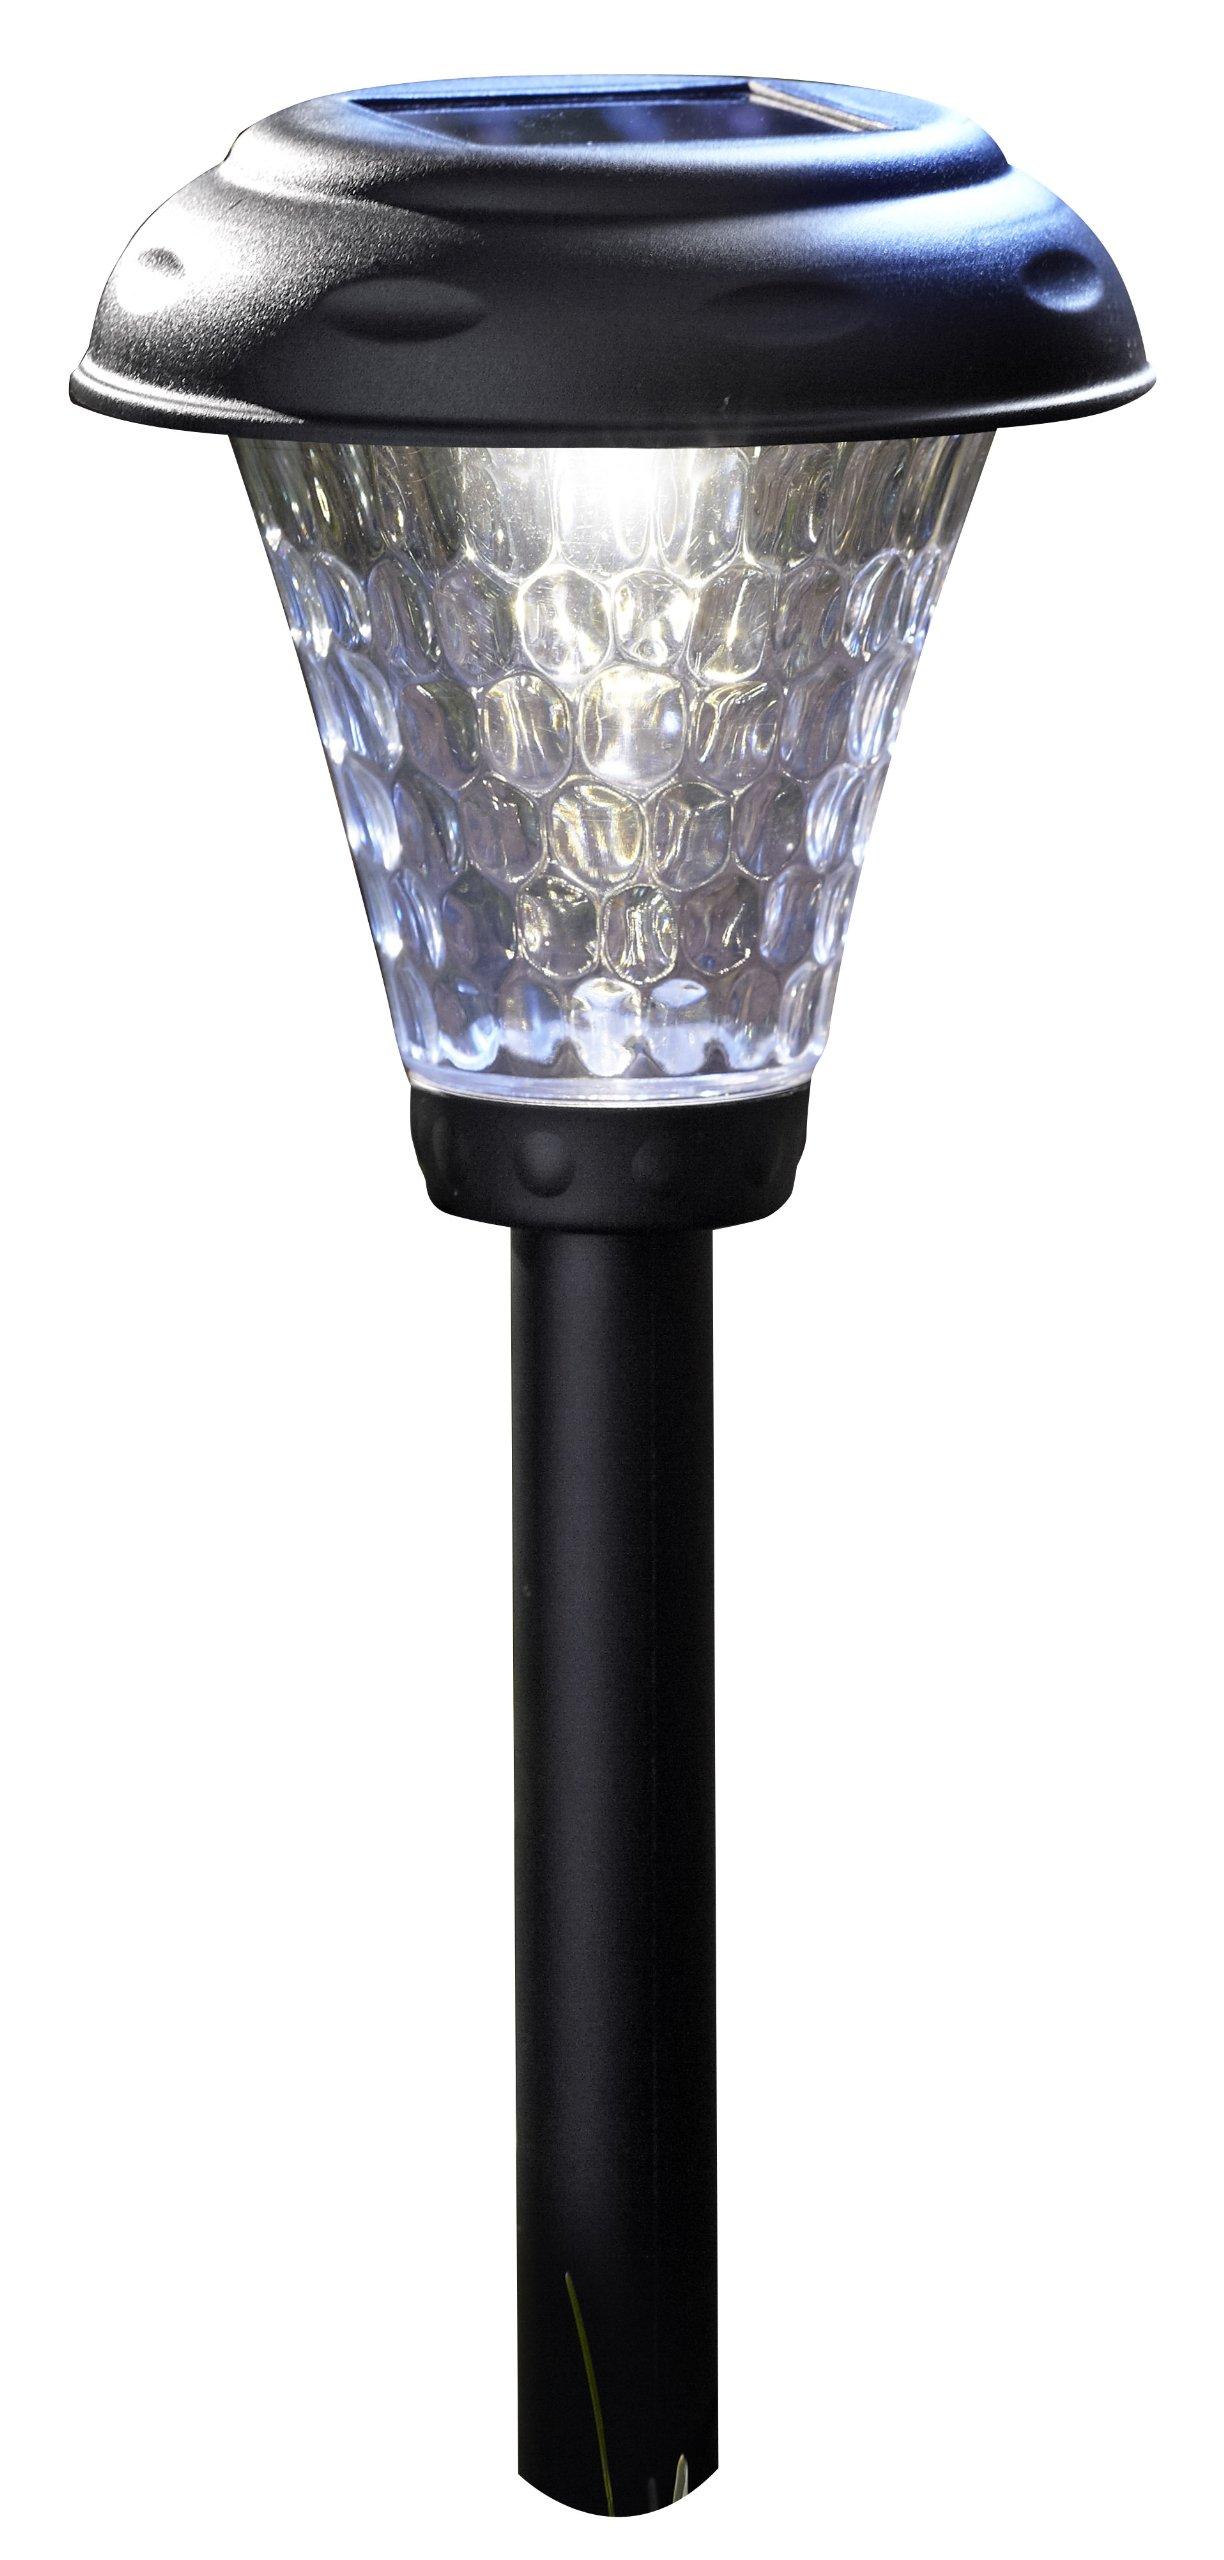 Moonrays 91381 Payton Solar LED Plastic Path Light, 2X-Brighter, 8-Pack